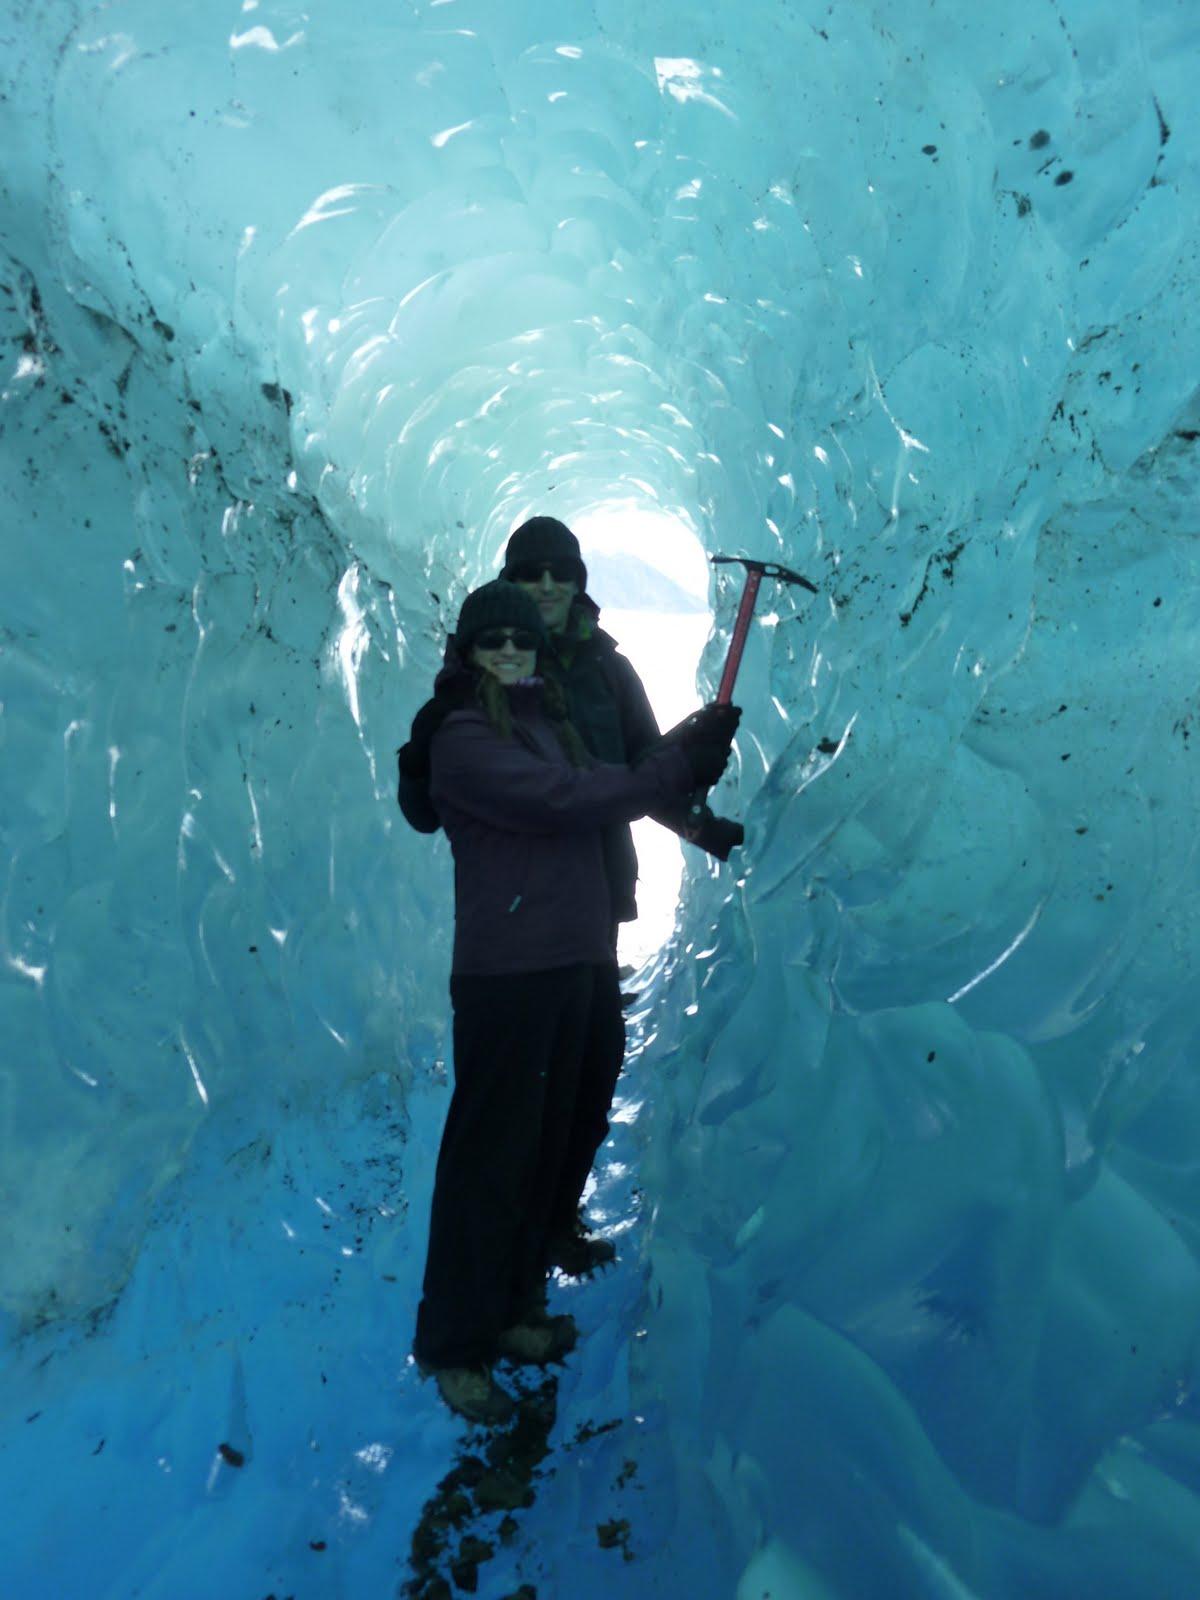 Glaciar Perito Moreno, Argentina, vuelta al mundo, round the world, La Aventura de Pablo y Elena